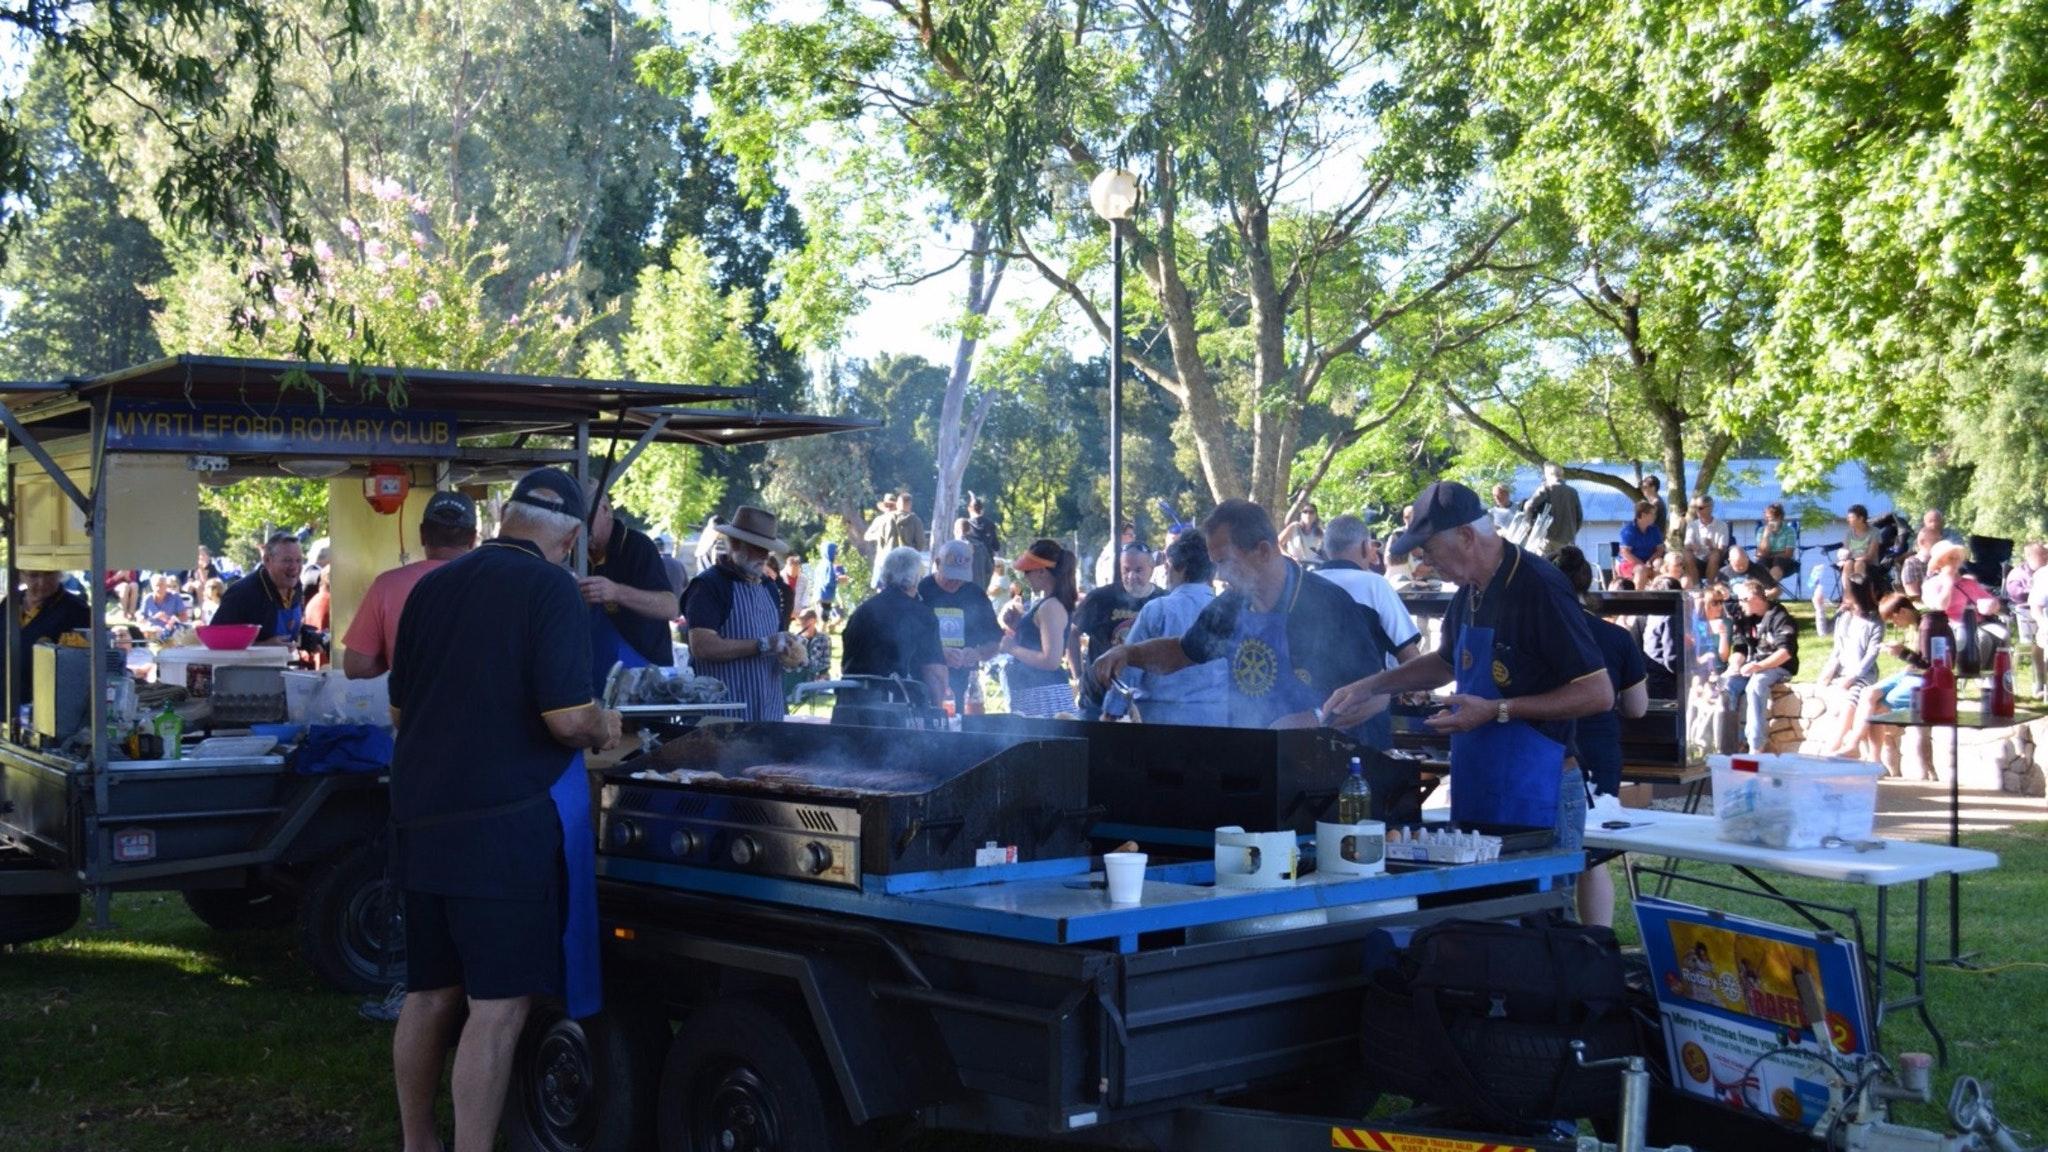 Alpine Shire Australia Day Community Celebrations in Myrtleford